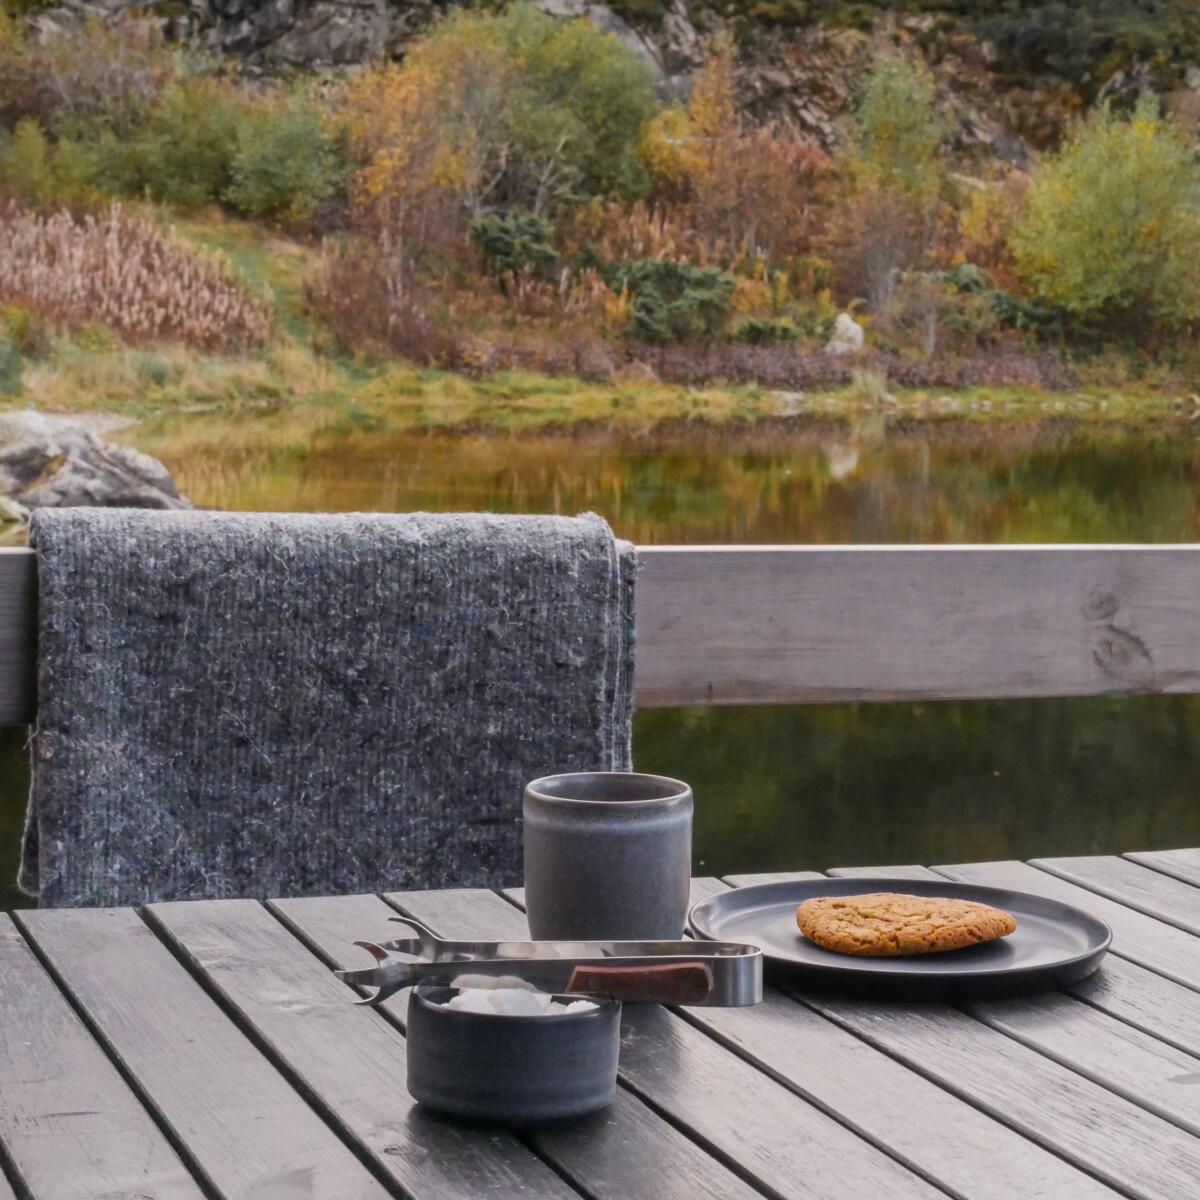 En kopp kaffe på PS Bryggekafé